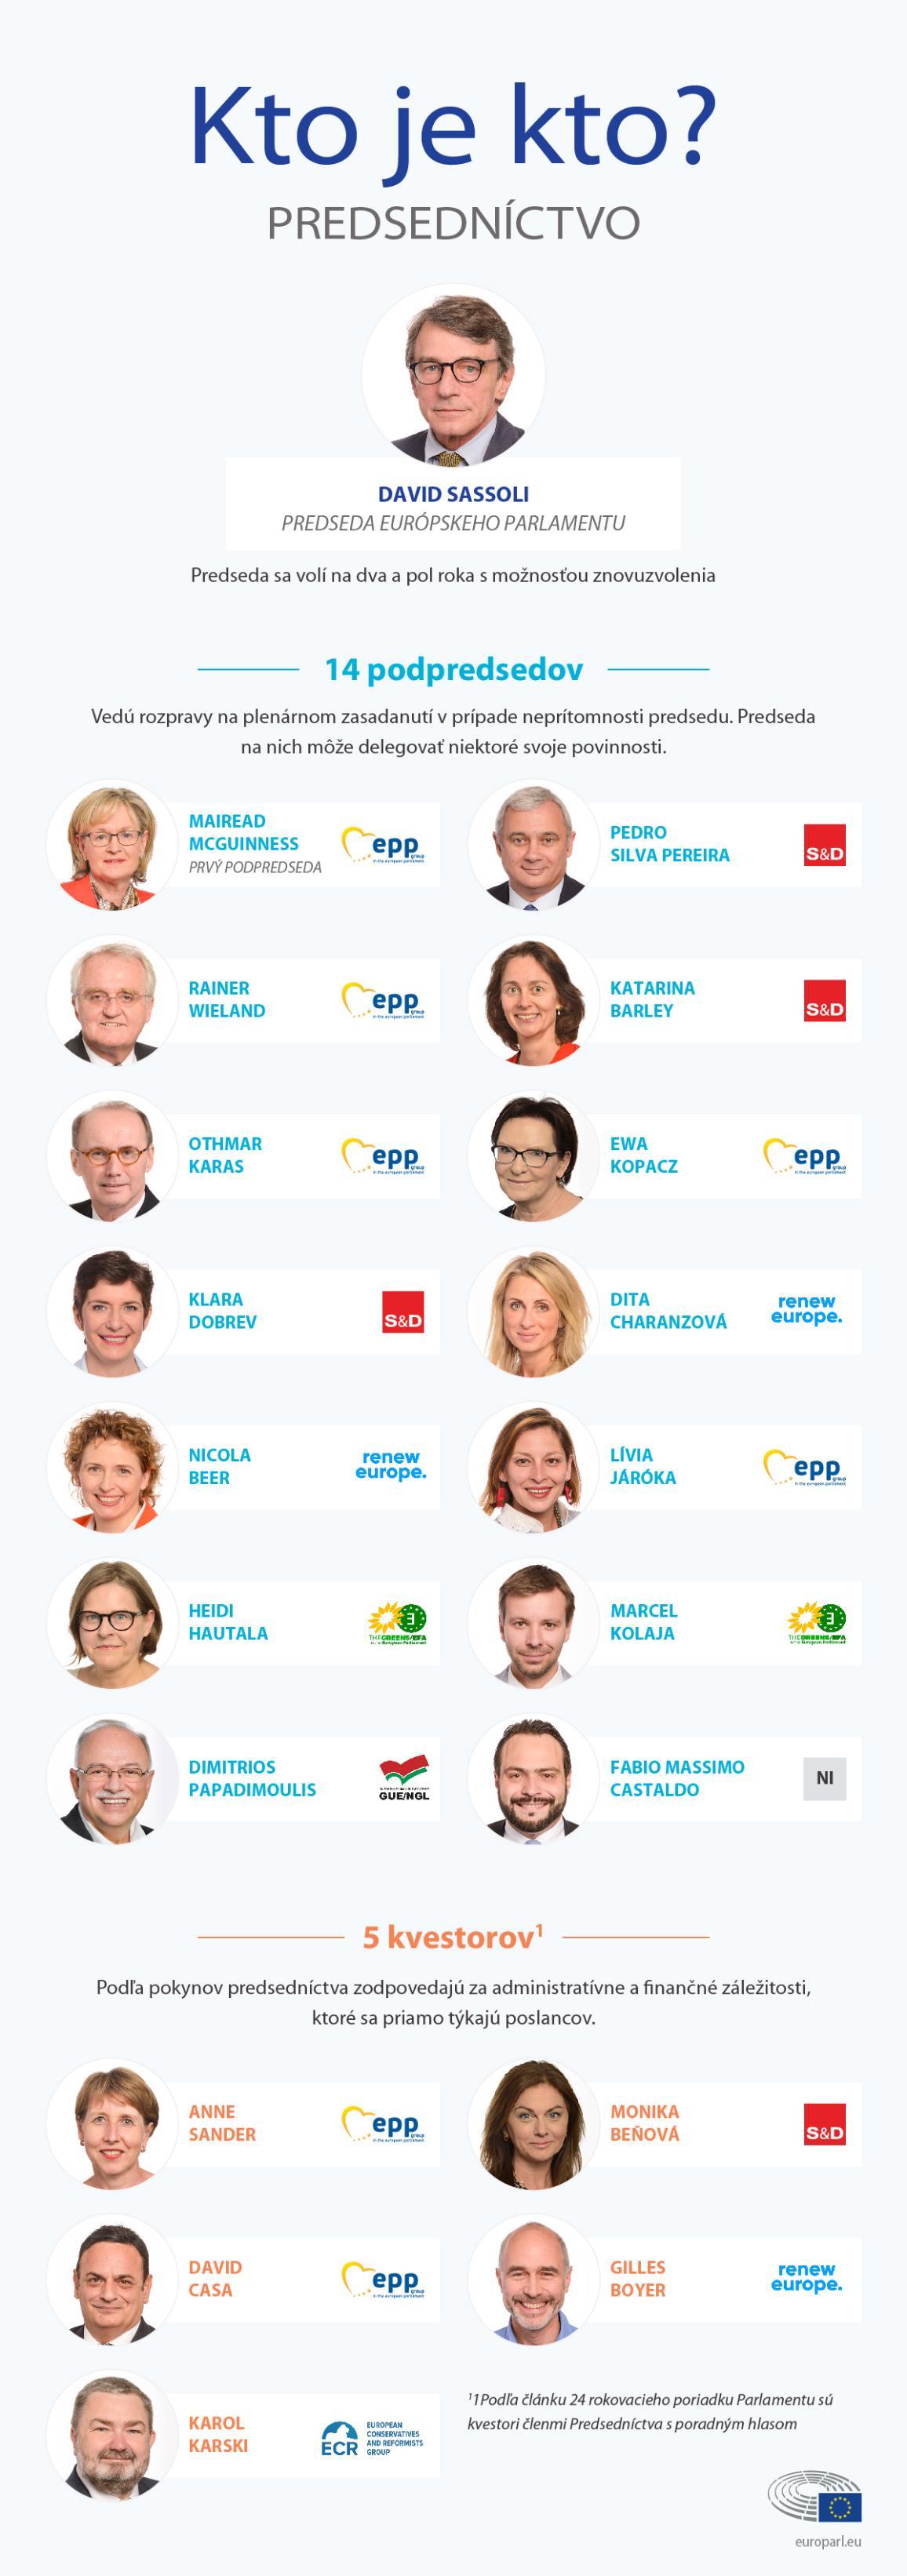 infografika s potrétmi a menami poslancov